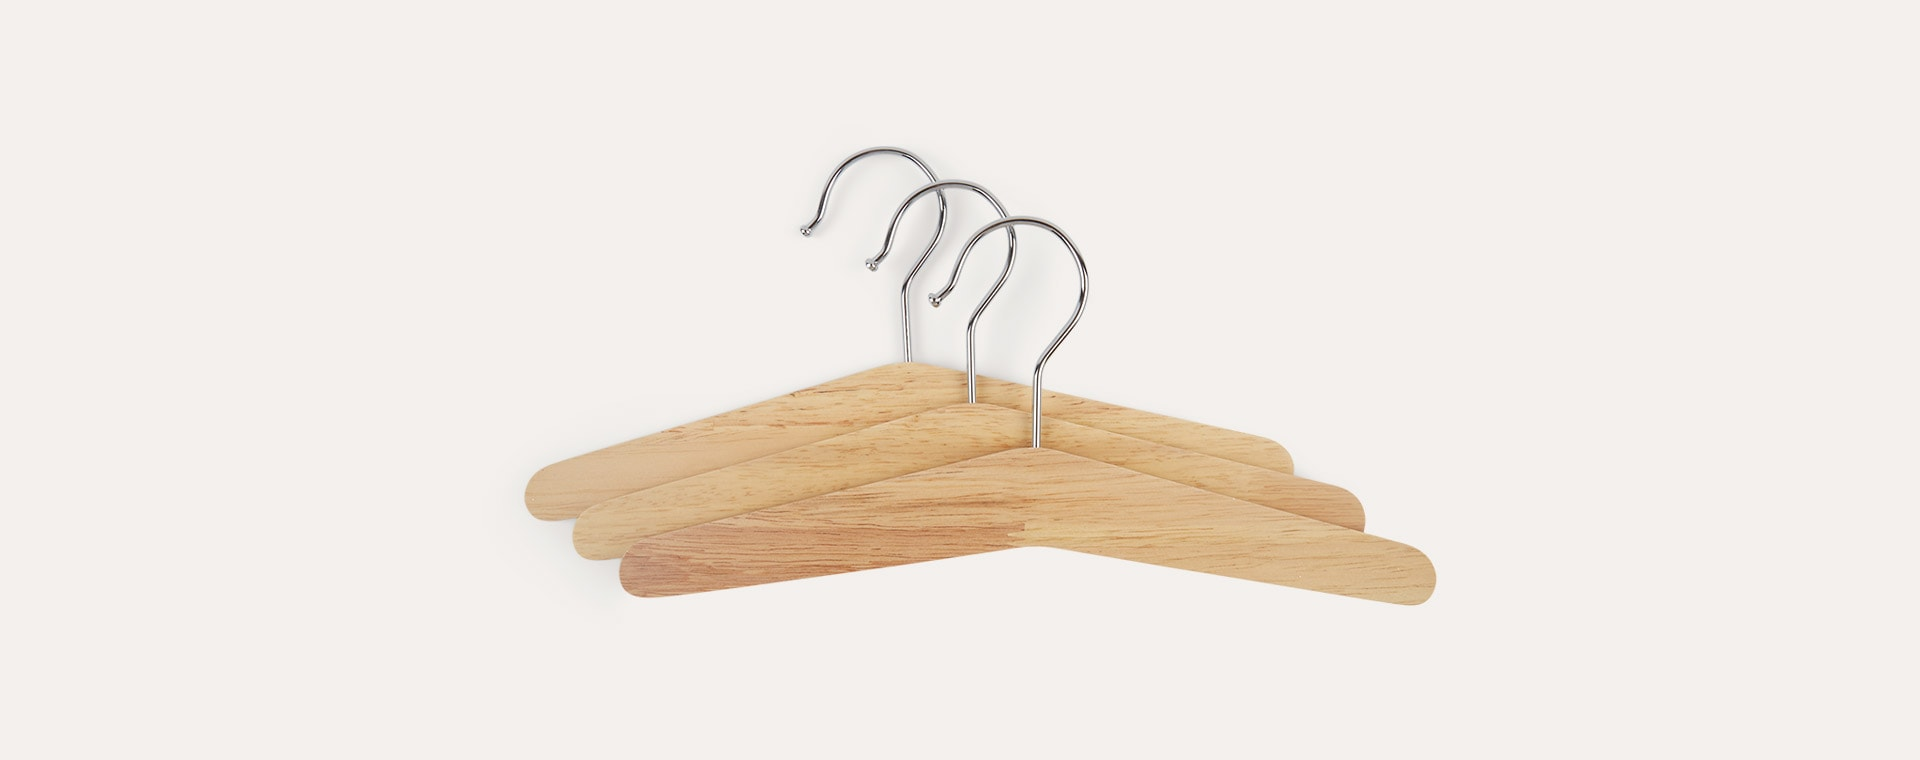 Neutral Kid's Concept Coat Hanger 3 Pack SAGA